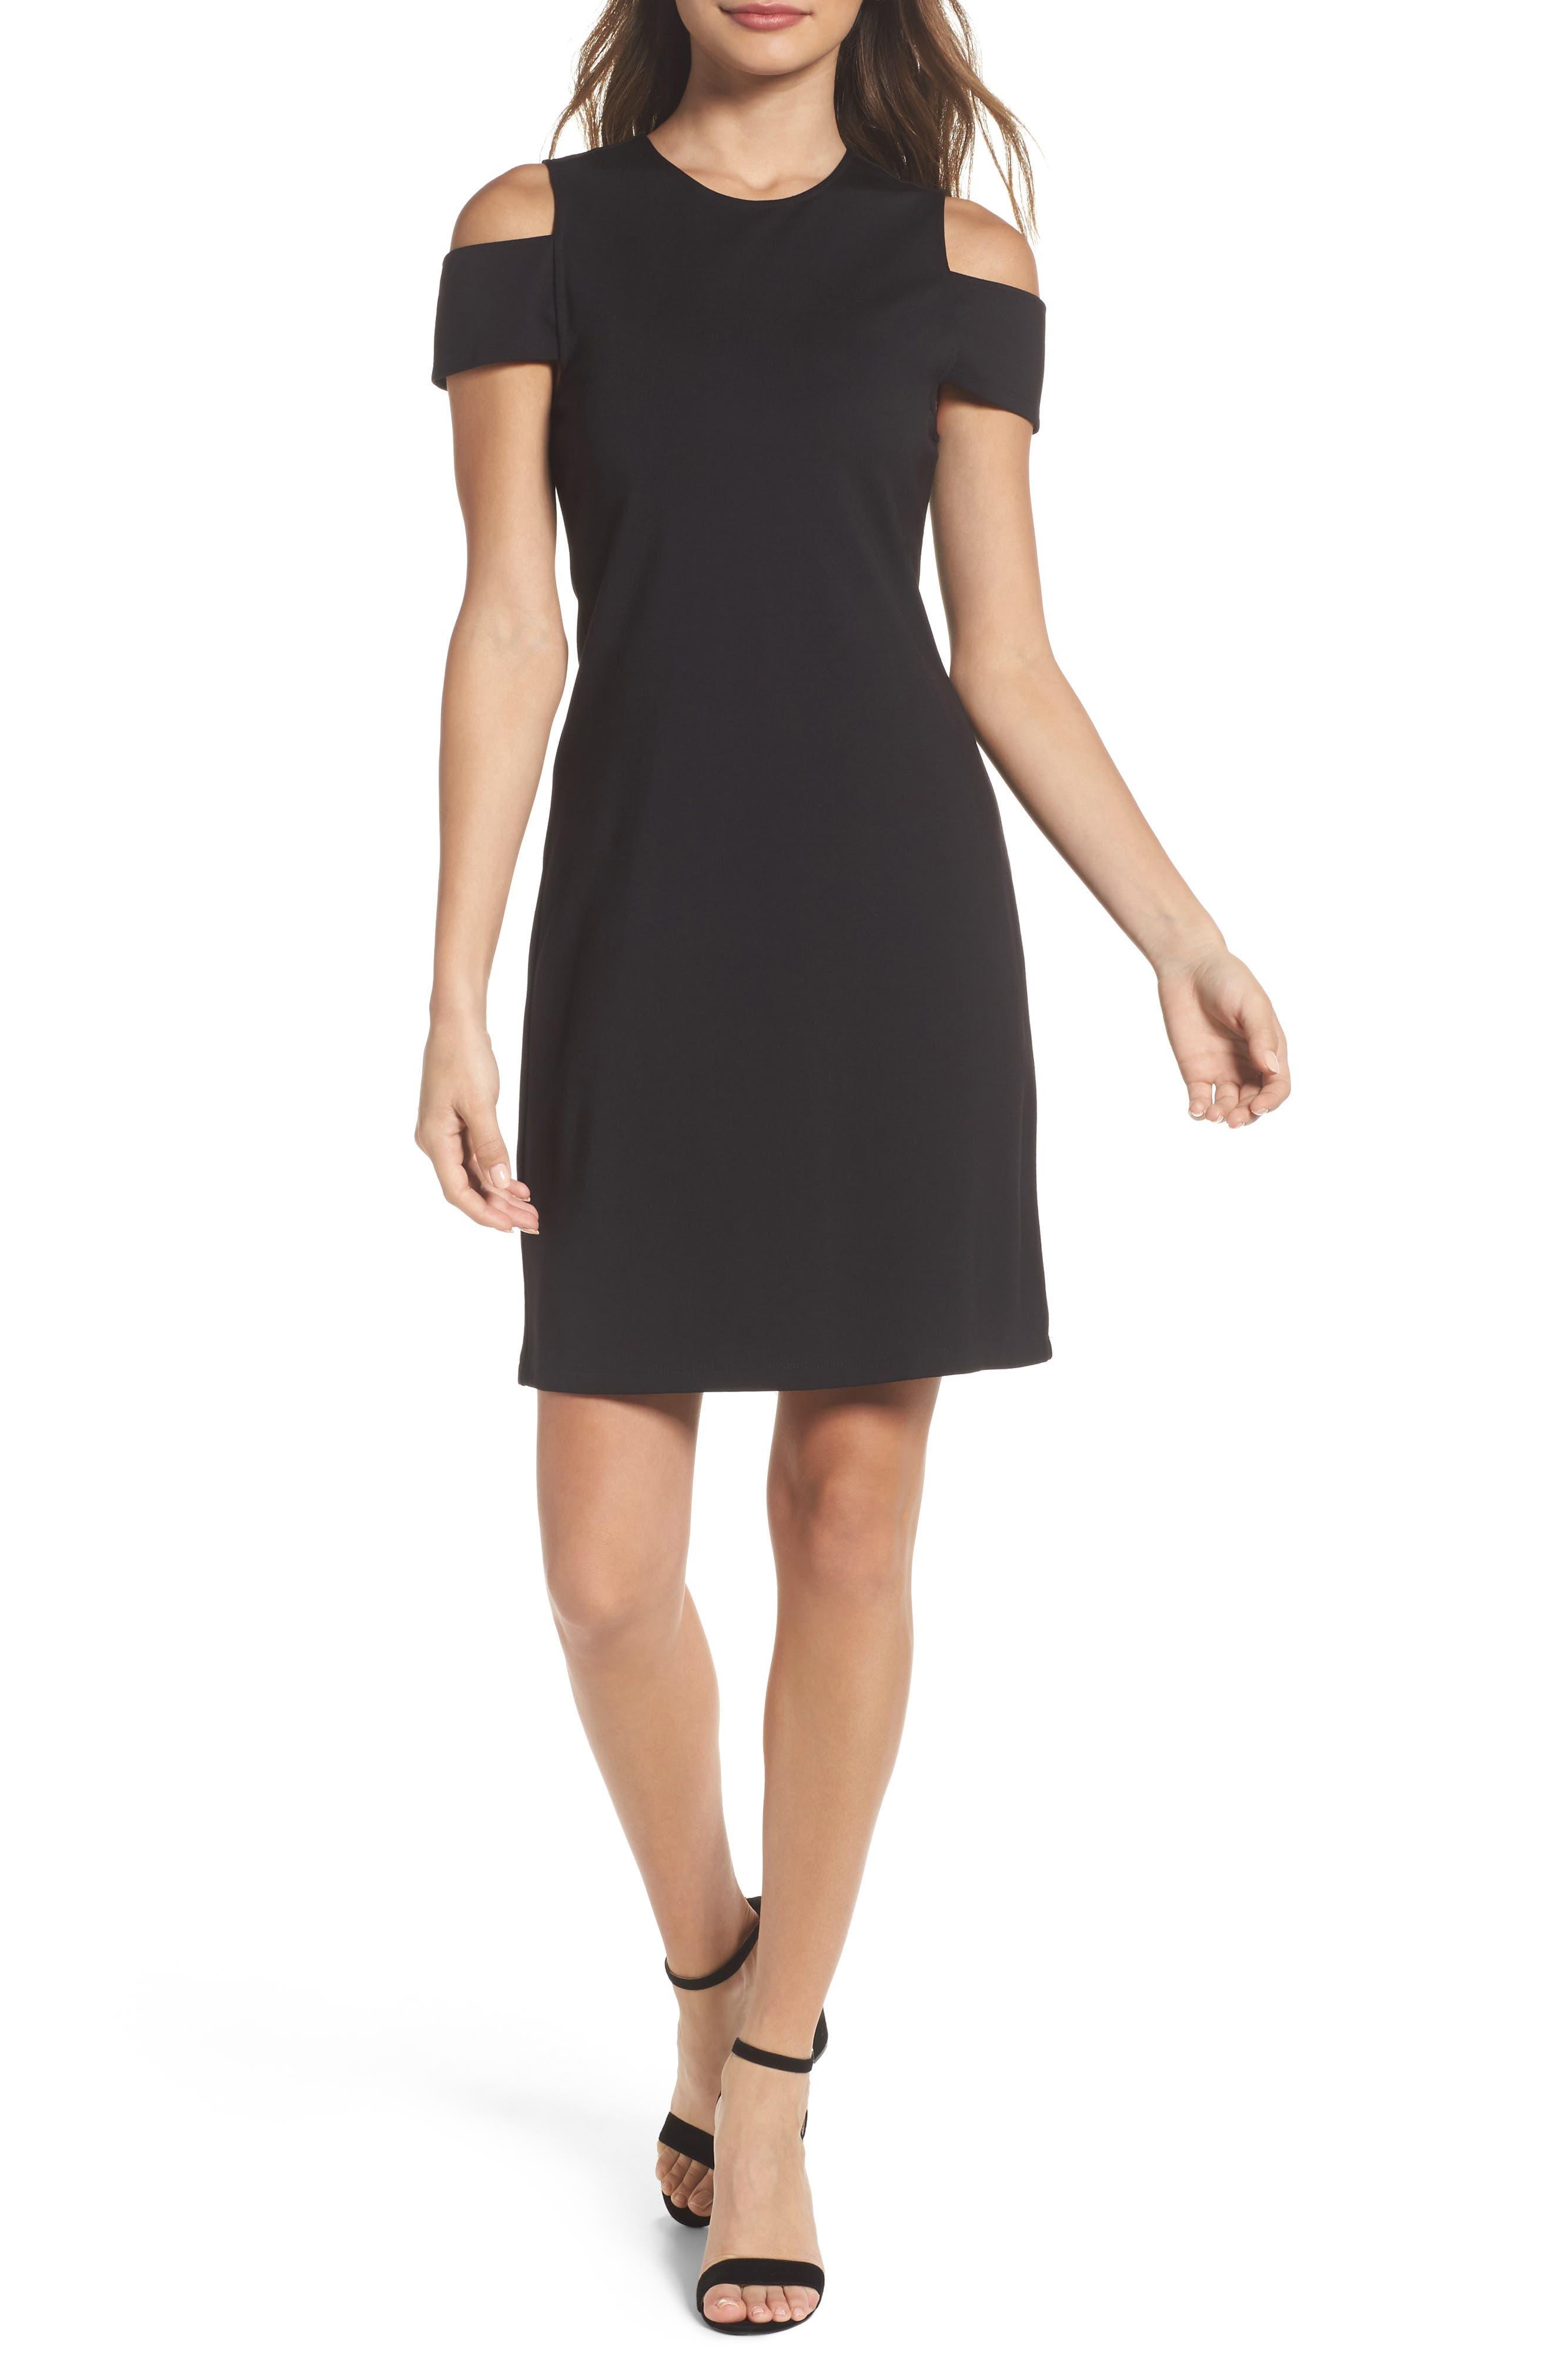 Alternate Image 1 Selected - BB Dakota Cold Shoulder Sheath Dress